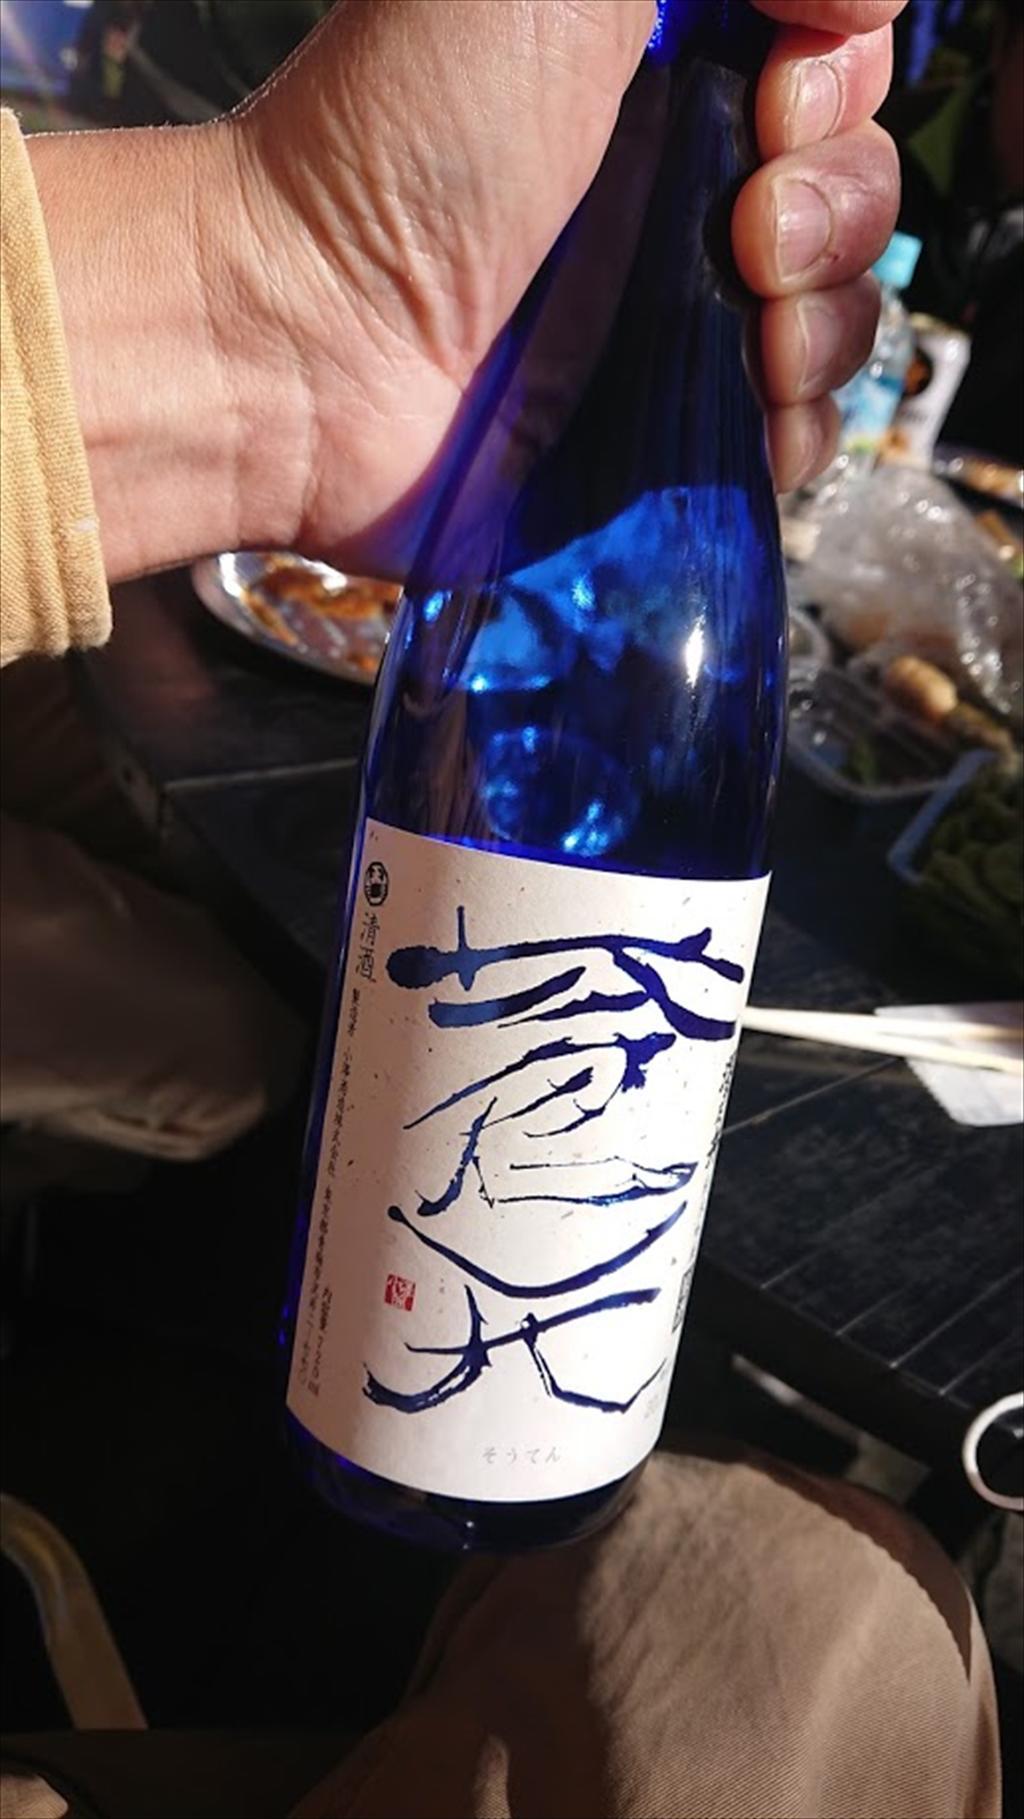 https://hayashida.jp/o/images2019-/DSC_1223_R.JPG